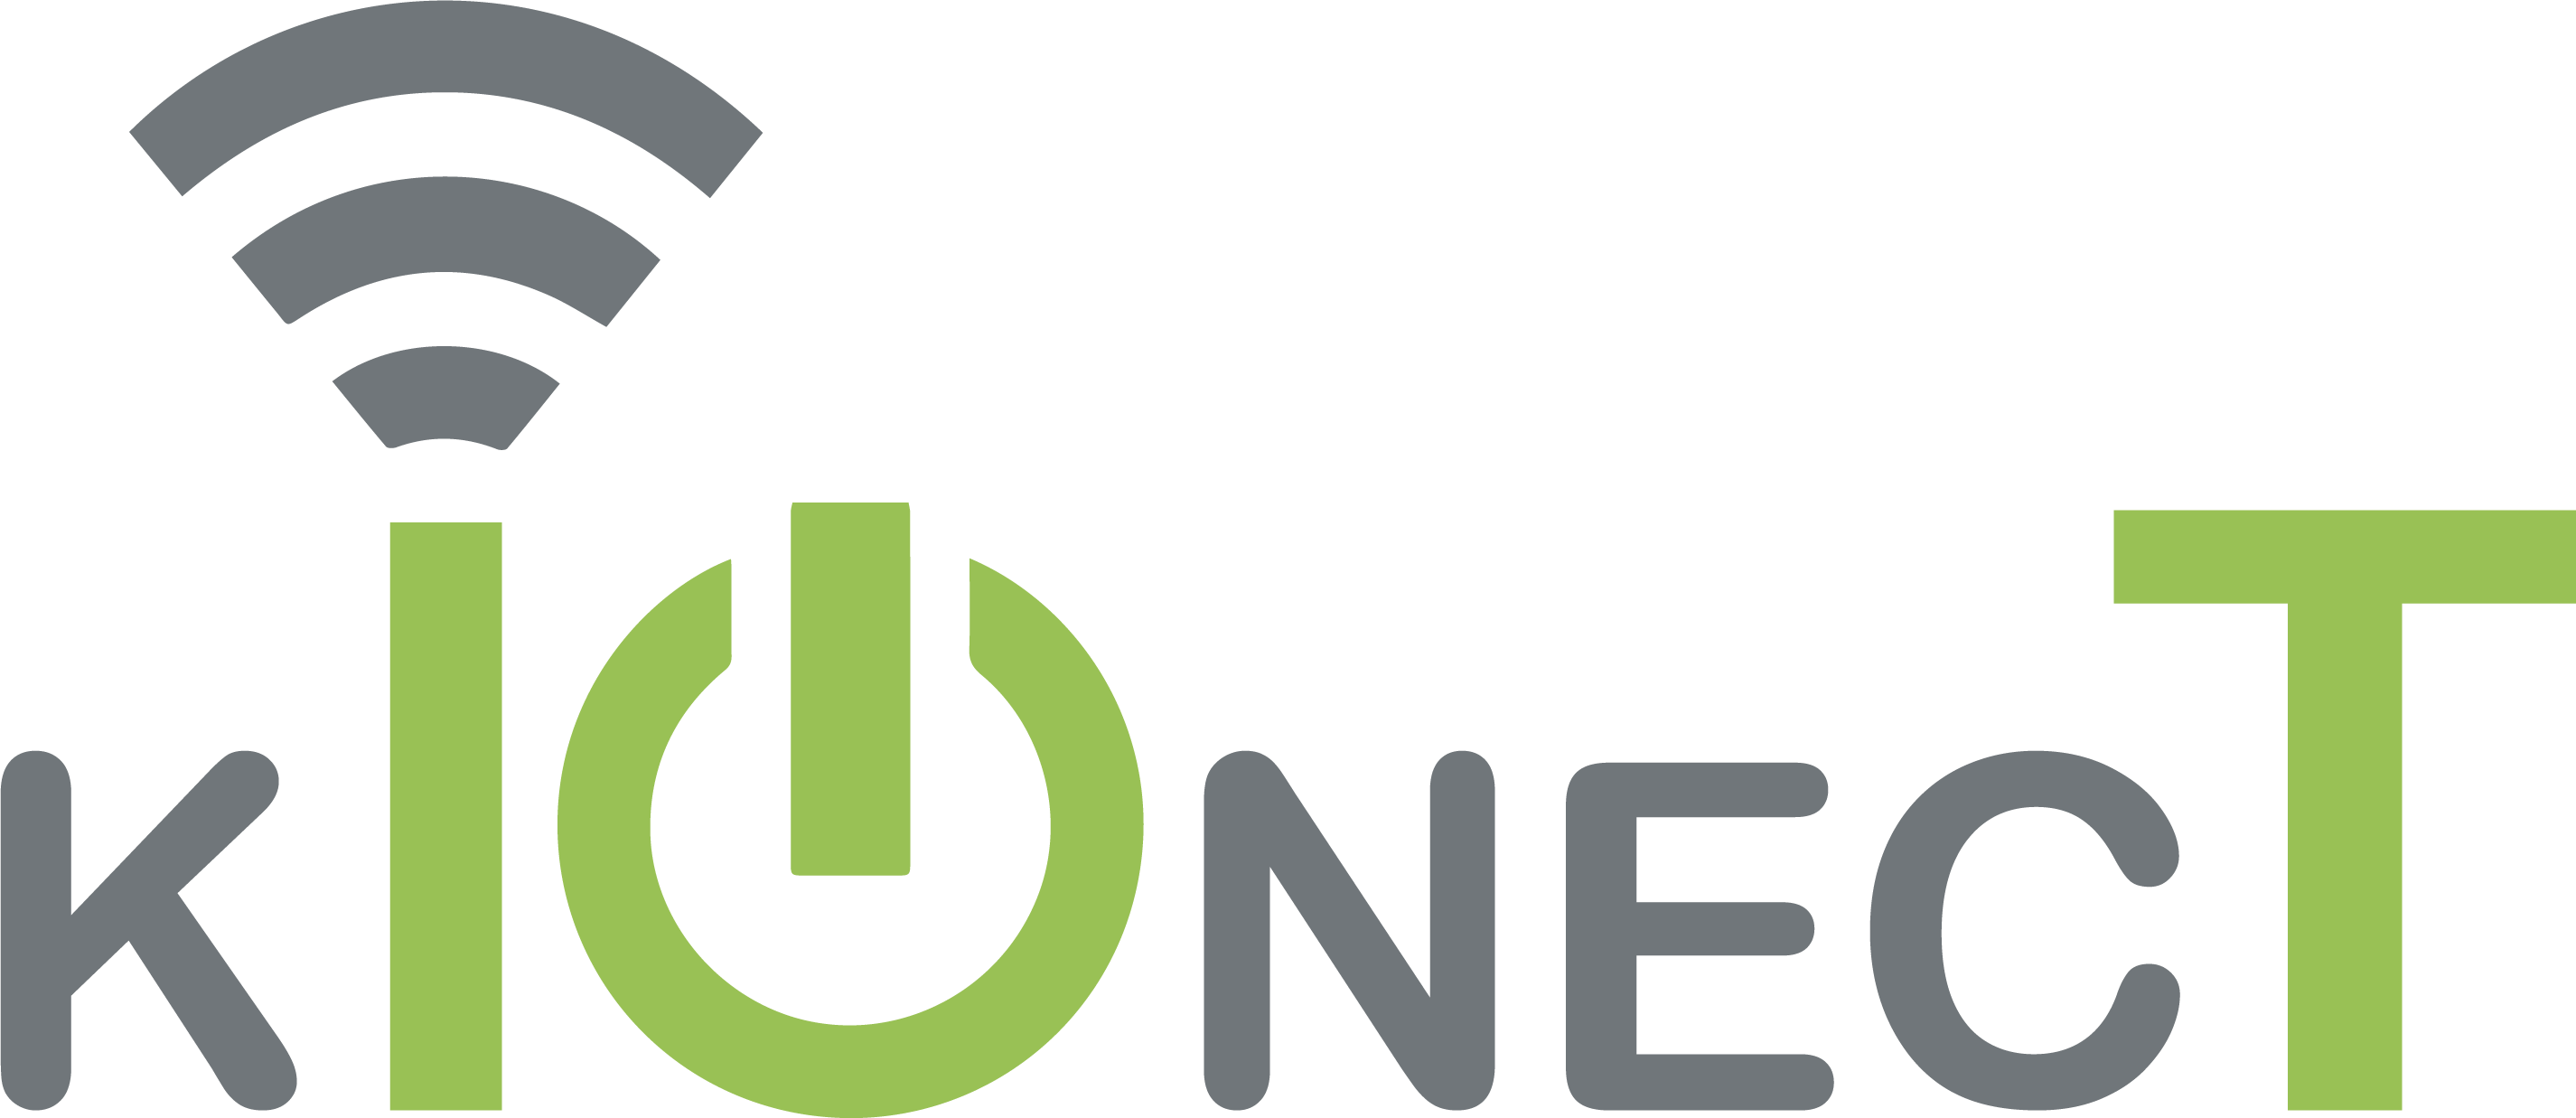 Kionect-logo